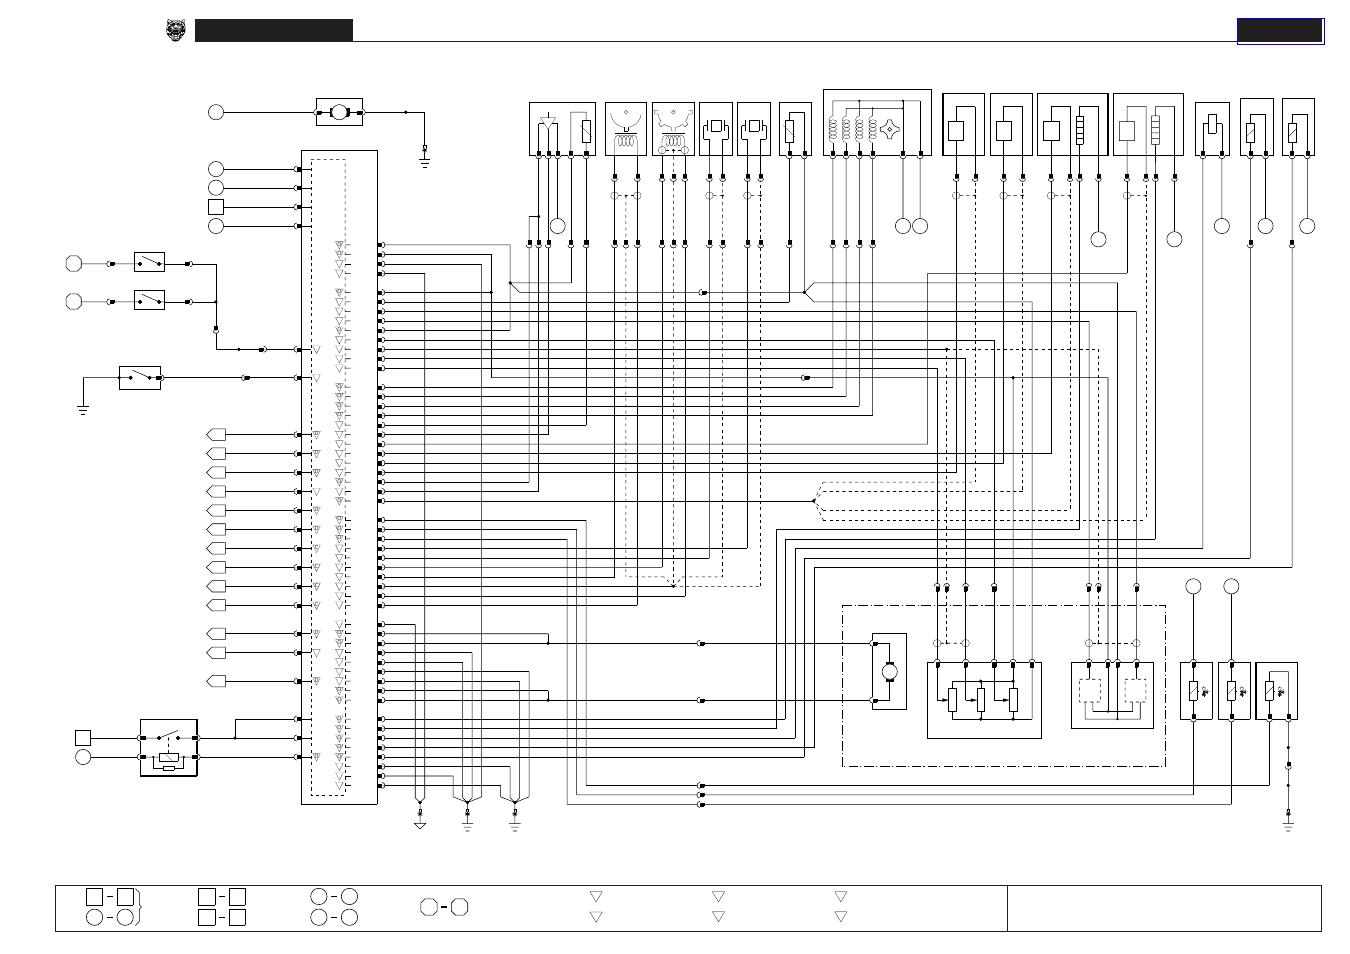 04 engine management, Engine management, Aj26 nas engine